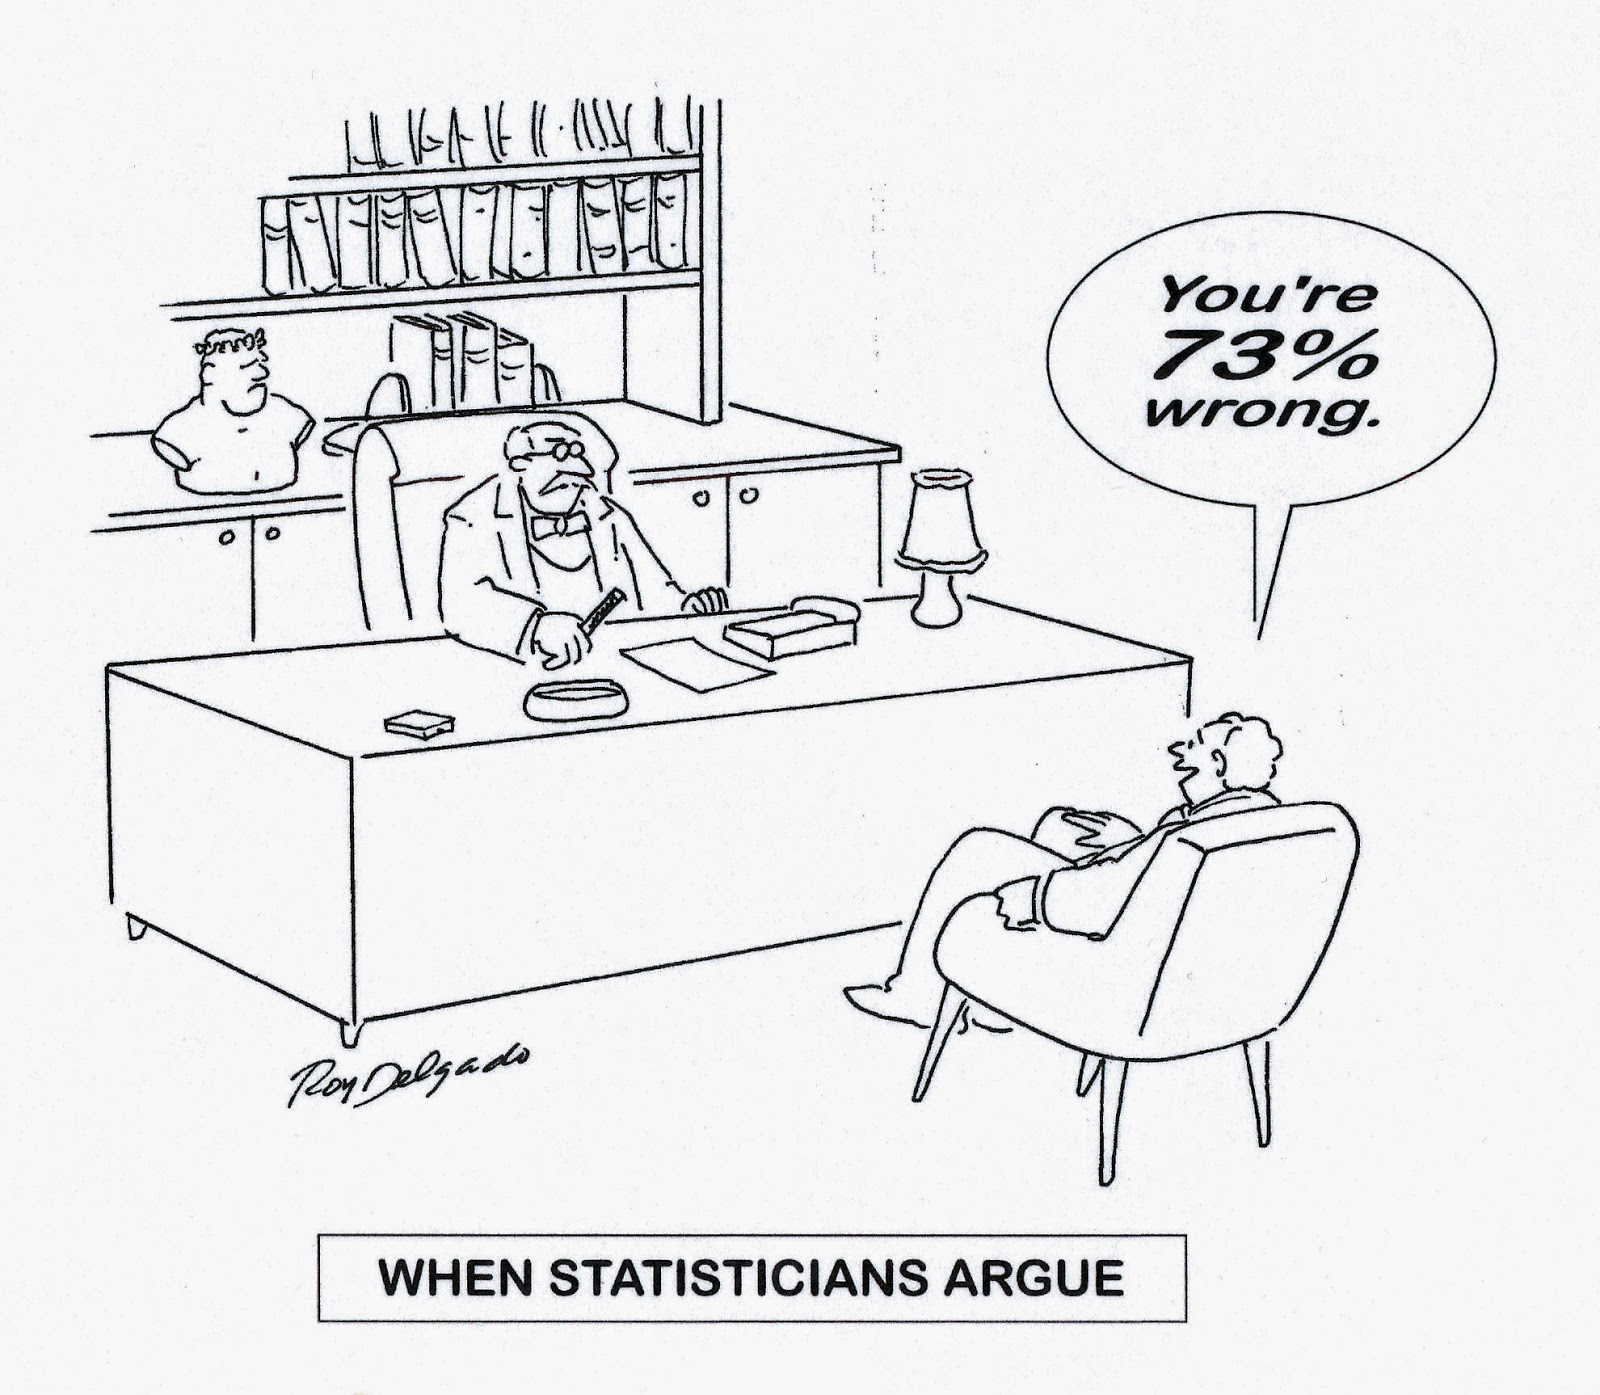 BishopBlog: Percentages, quasi statistics and bad arguments